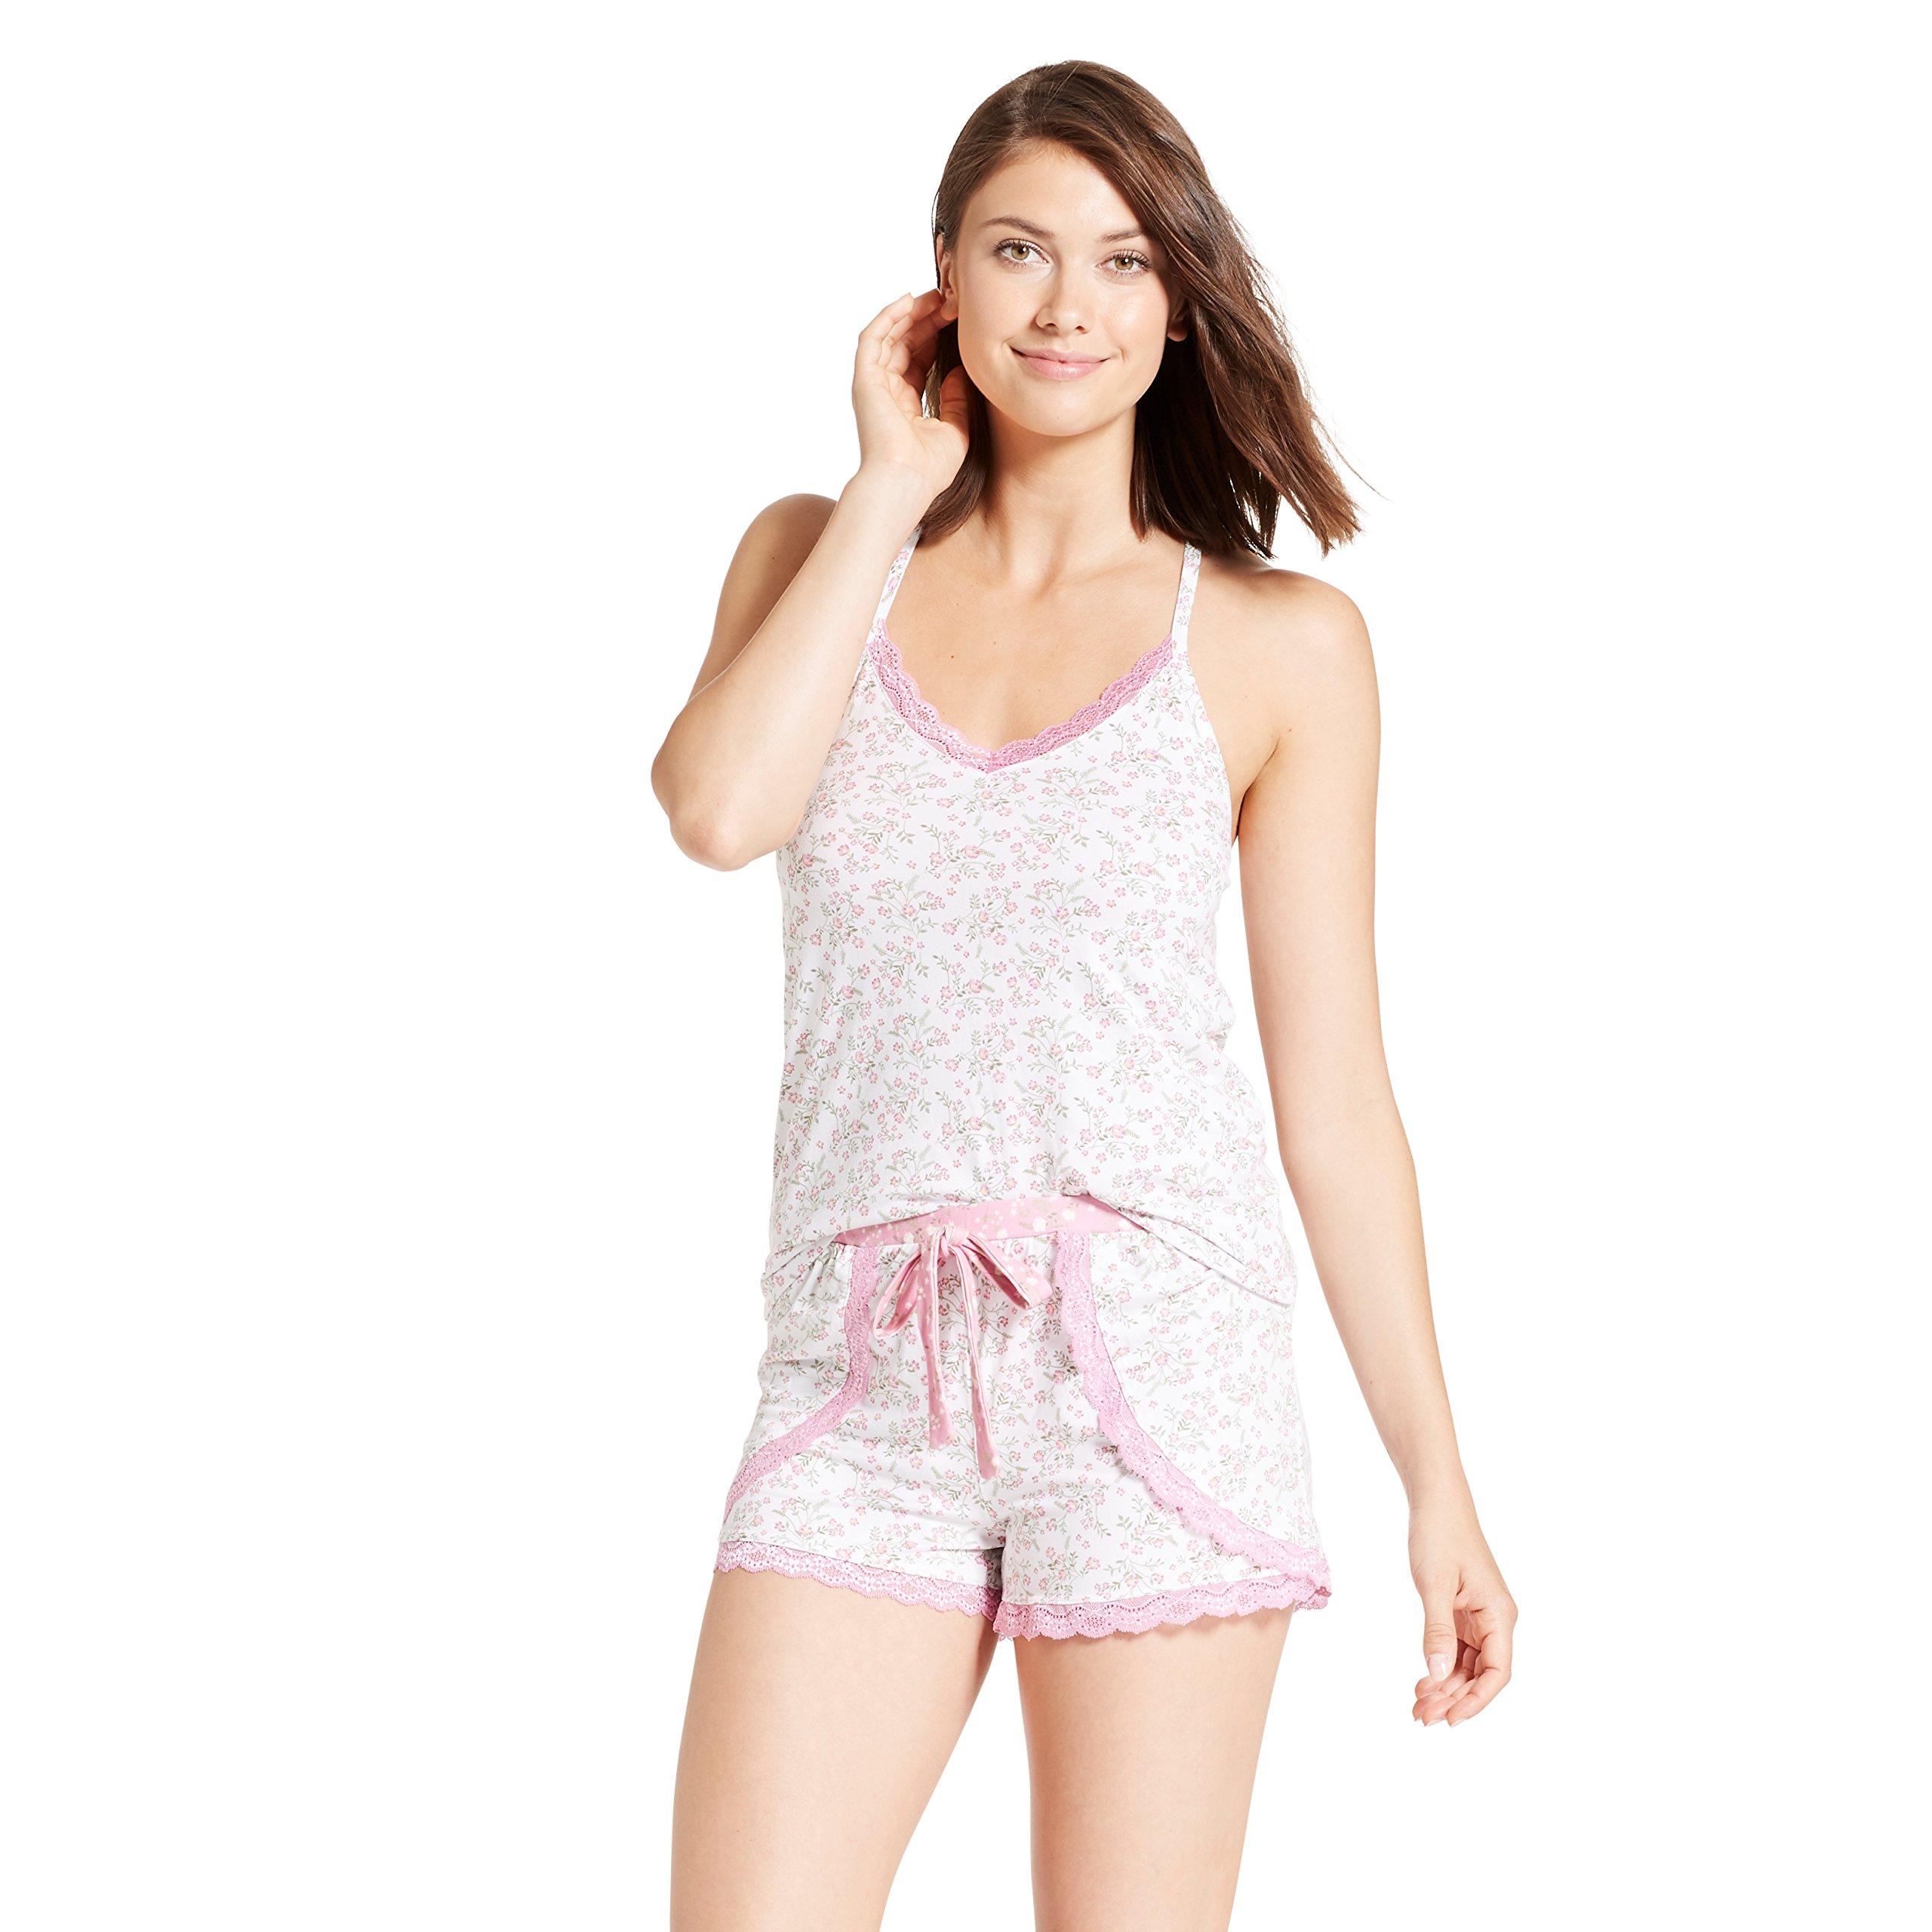 Nanette Nanette Lepore Womens Racerback Shirt Elastic Waist Shorts Pajama Set Spring White Large by Nanette Lepore (Image #1)